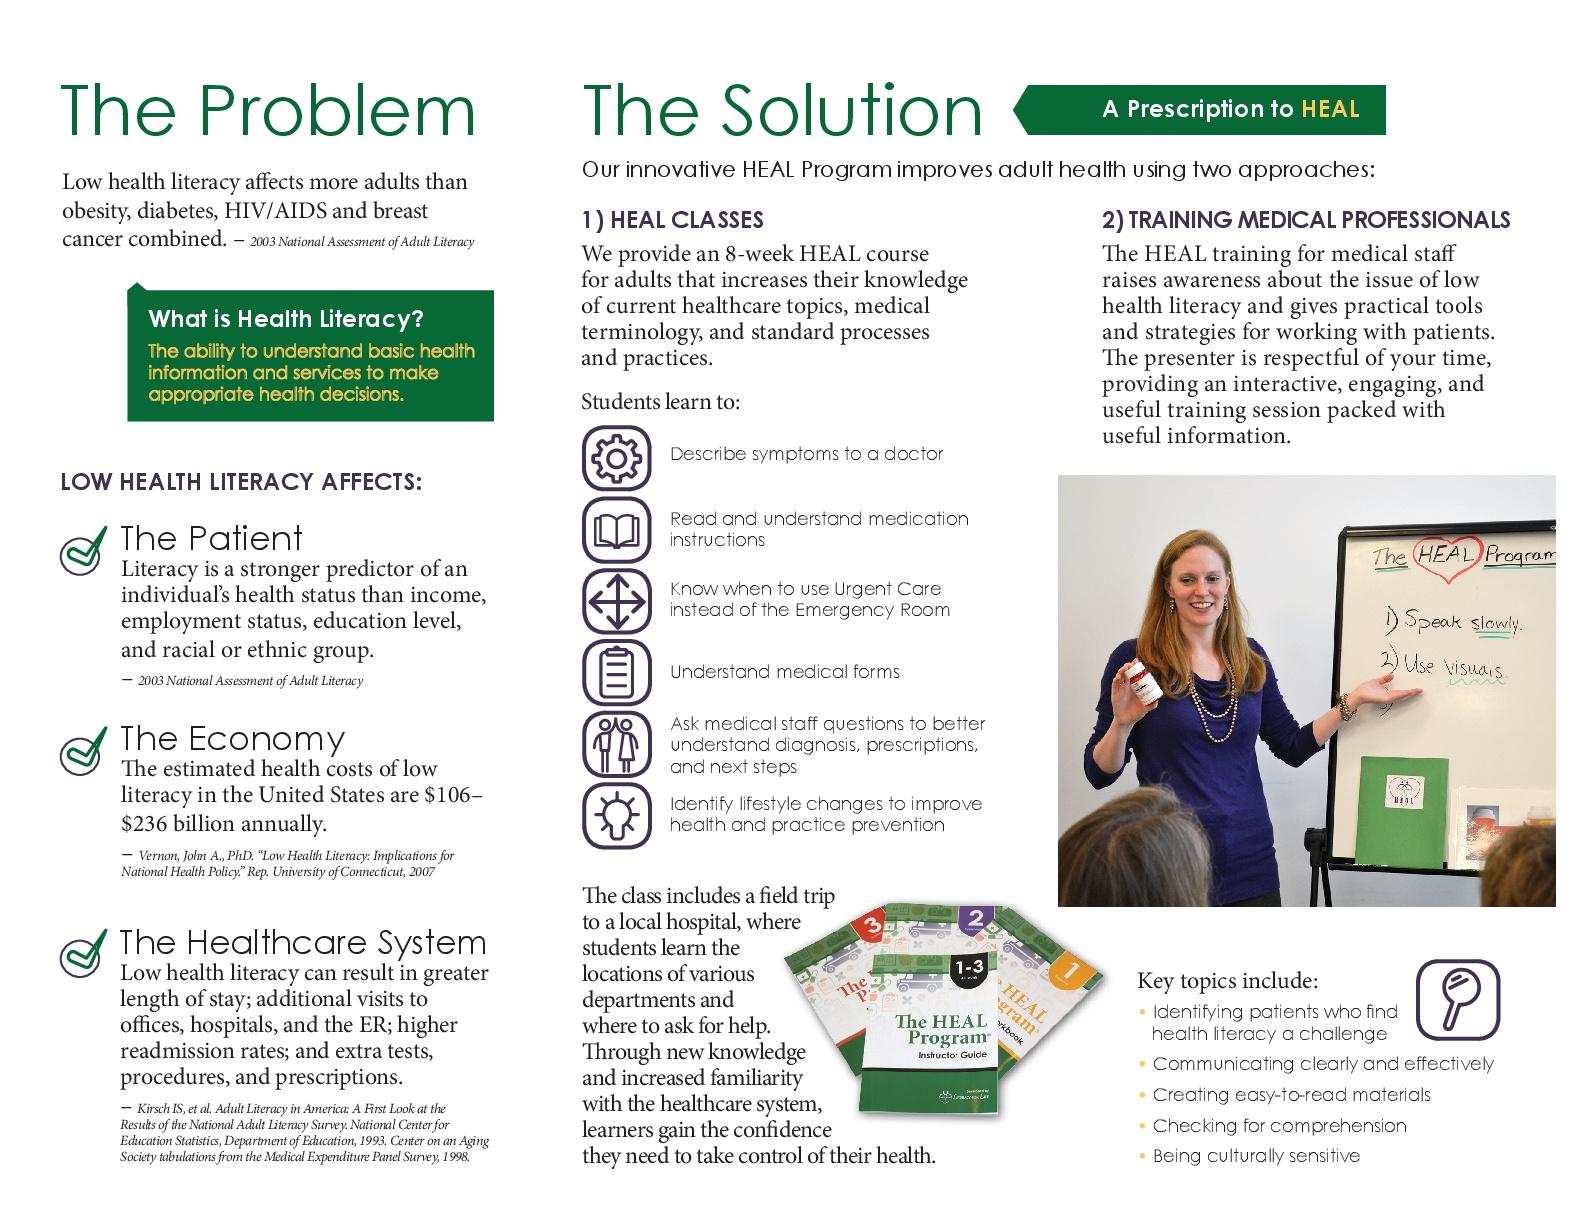 HEAL-brochure-generic,-for-desktop-printing-(1)-002.jpg